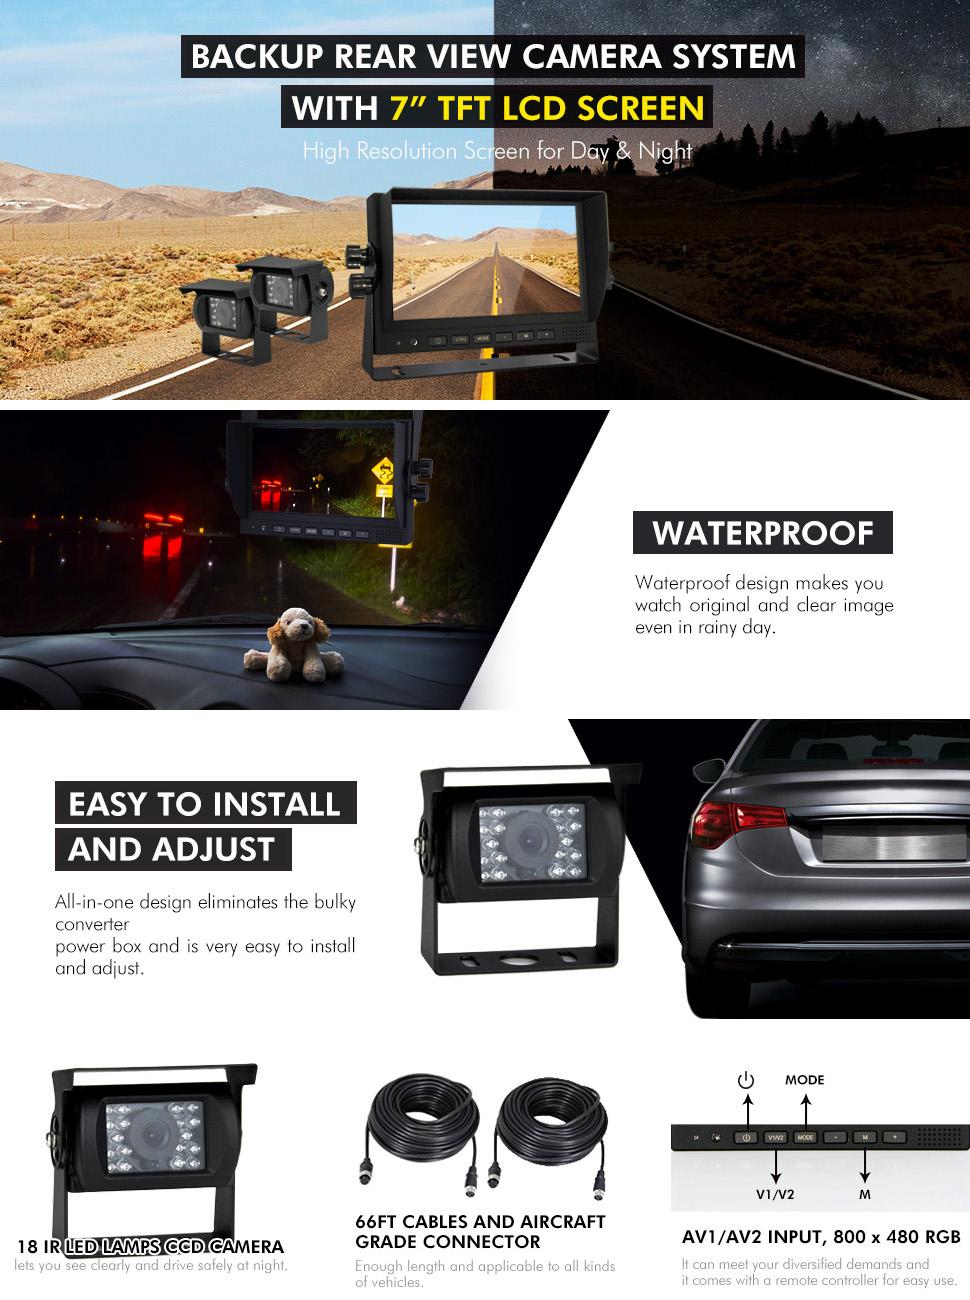 Amazon.com: Sistema de cámara Esky: Cell Phones & Accessories